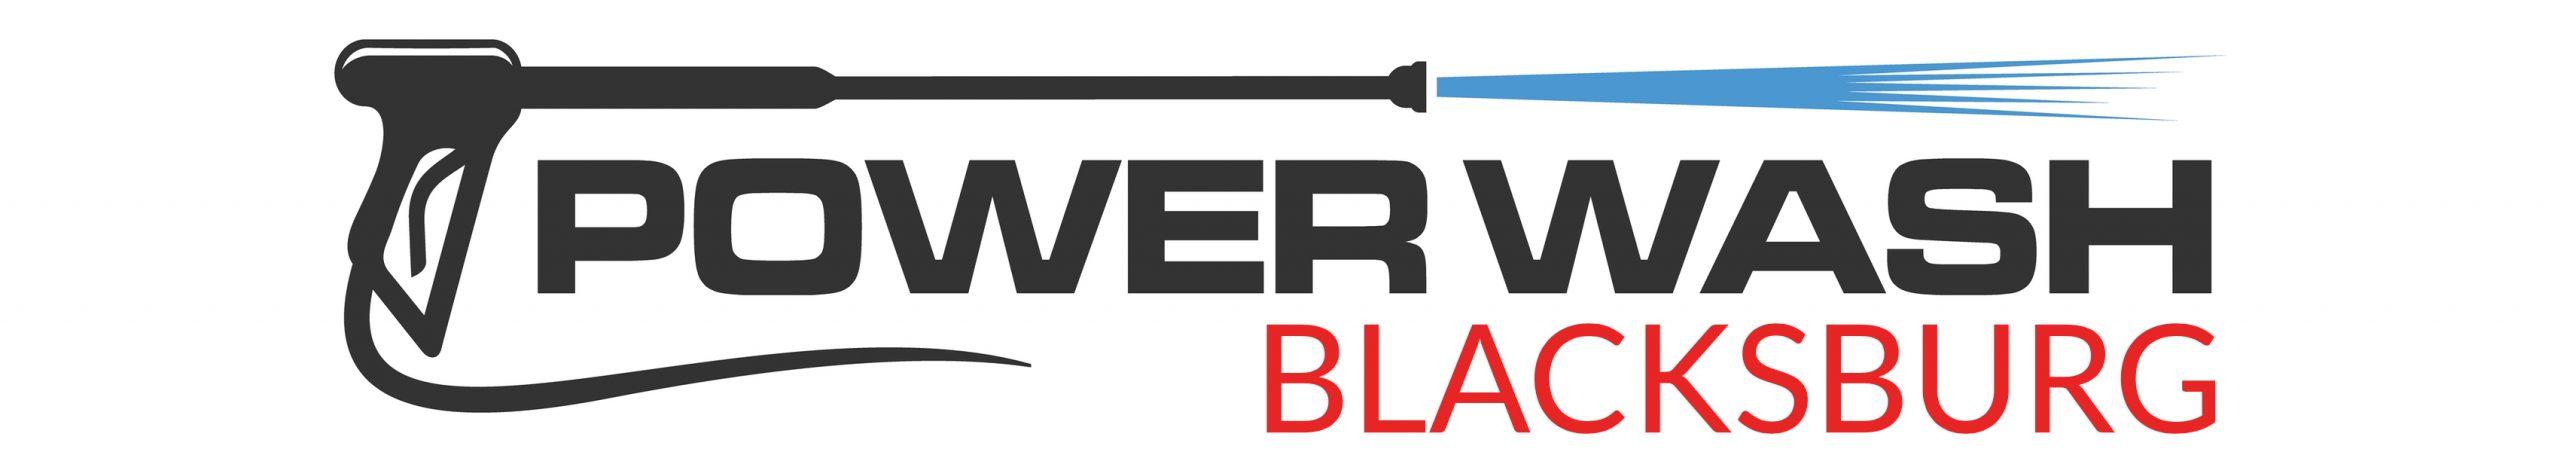 Power Wash Blacksburg